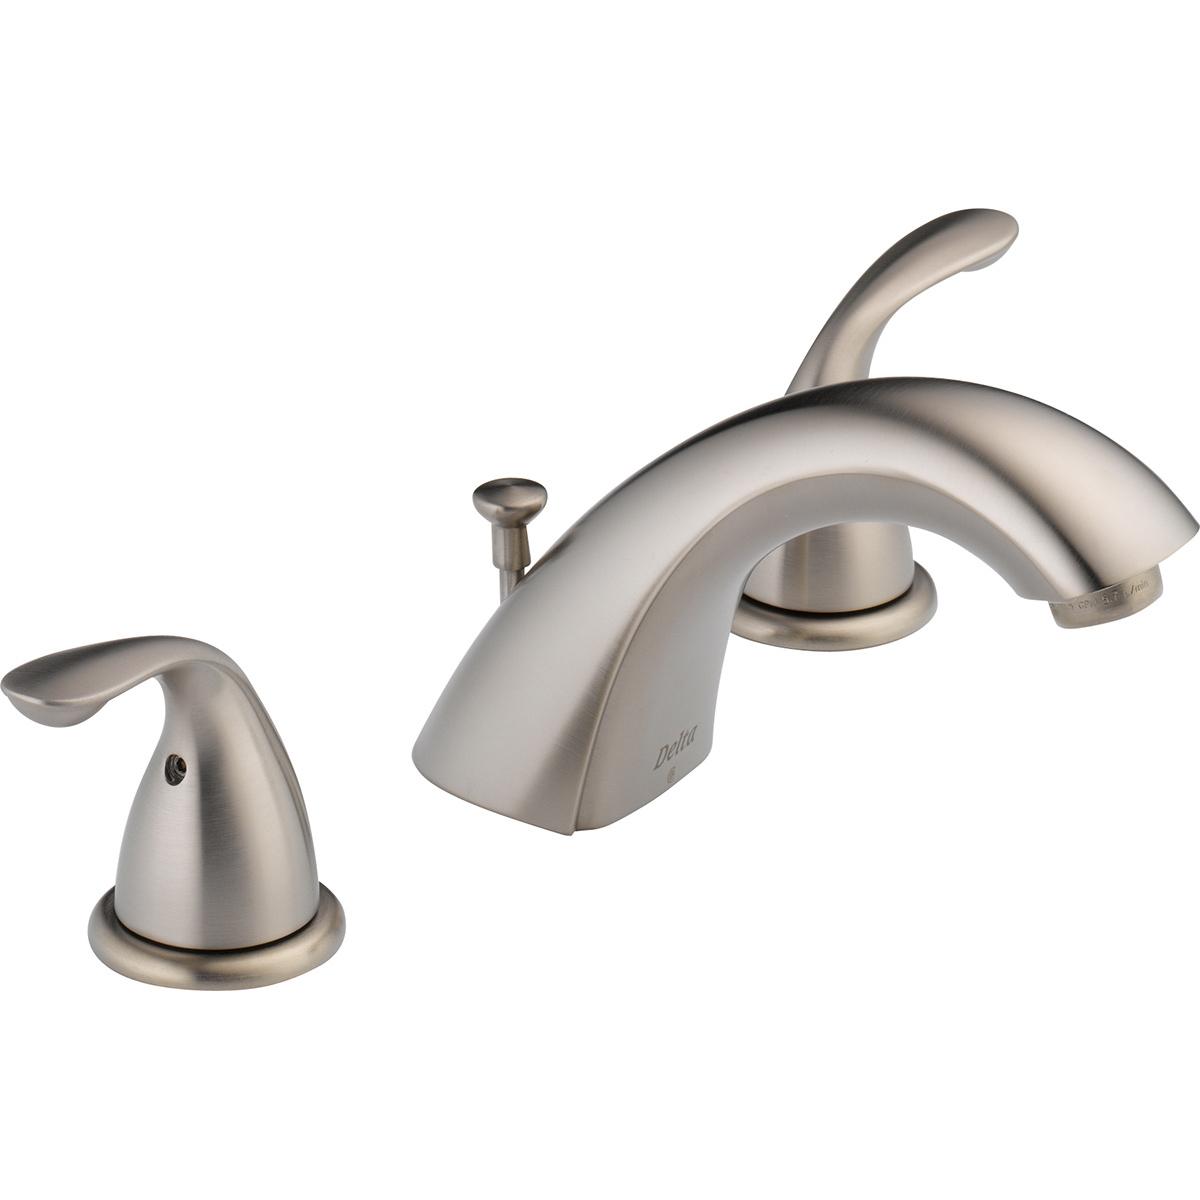 Bath4All - Delta 3530lf-mpu Classic Widespread Bathroom Faucet with ...